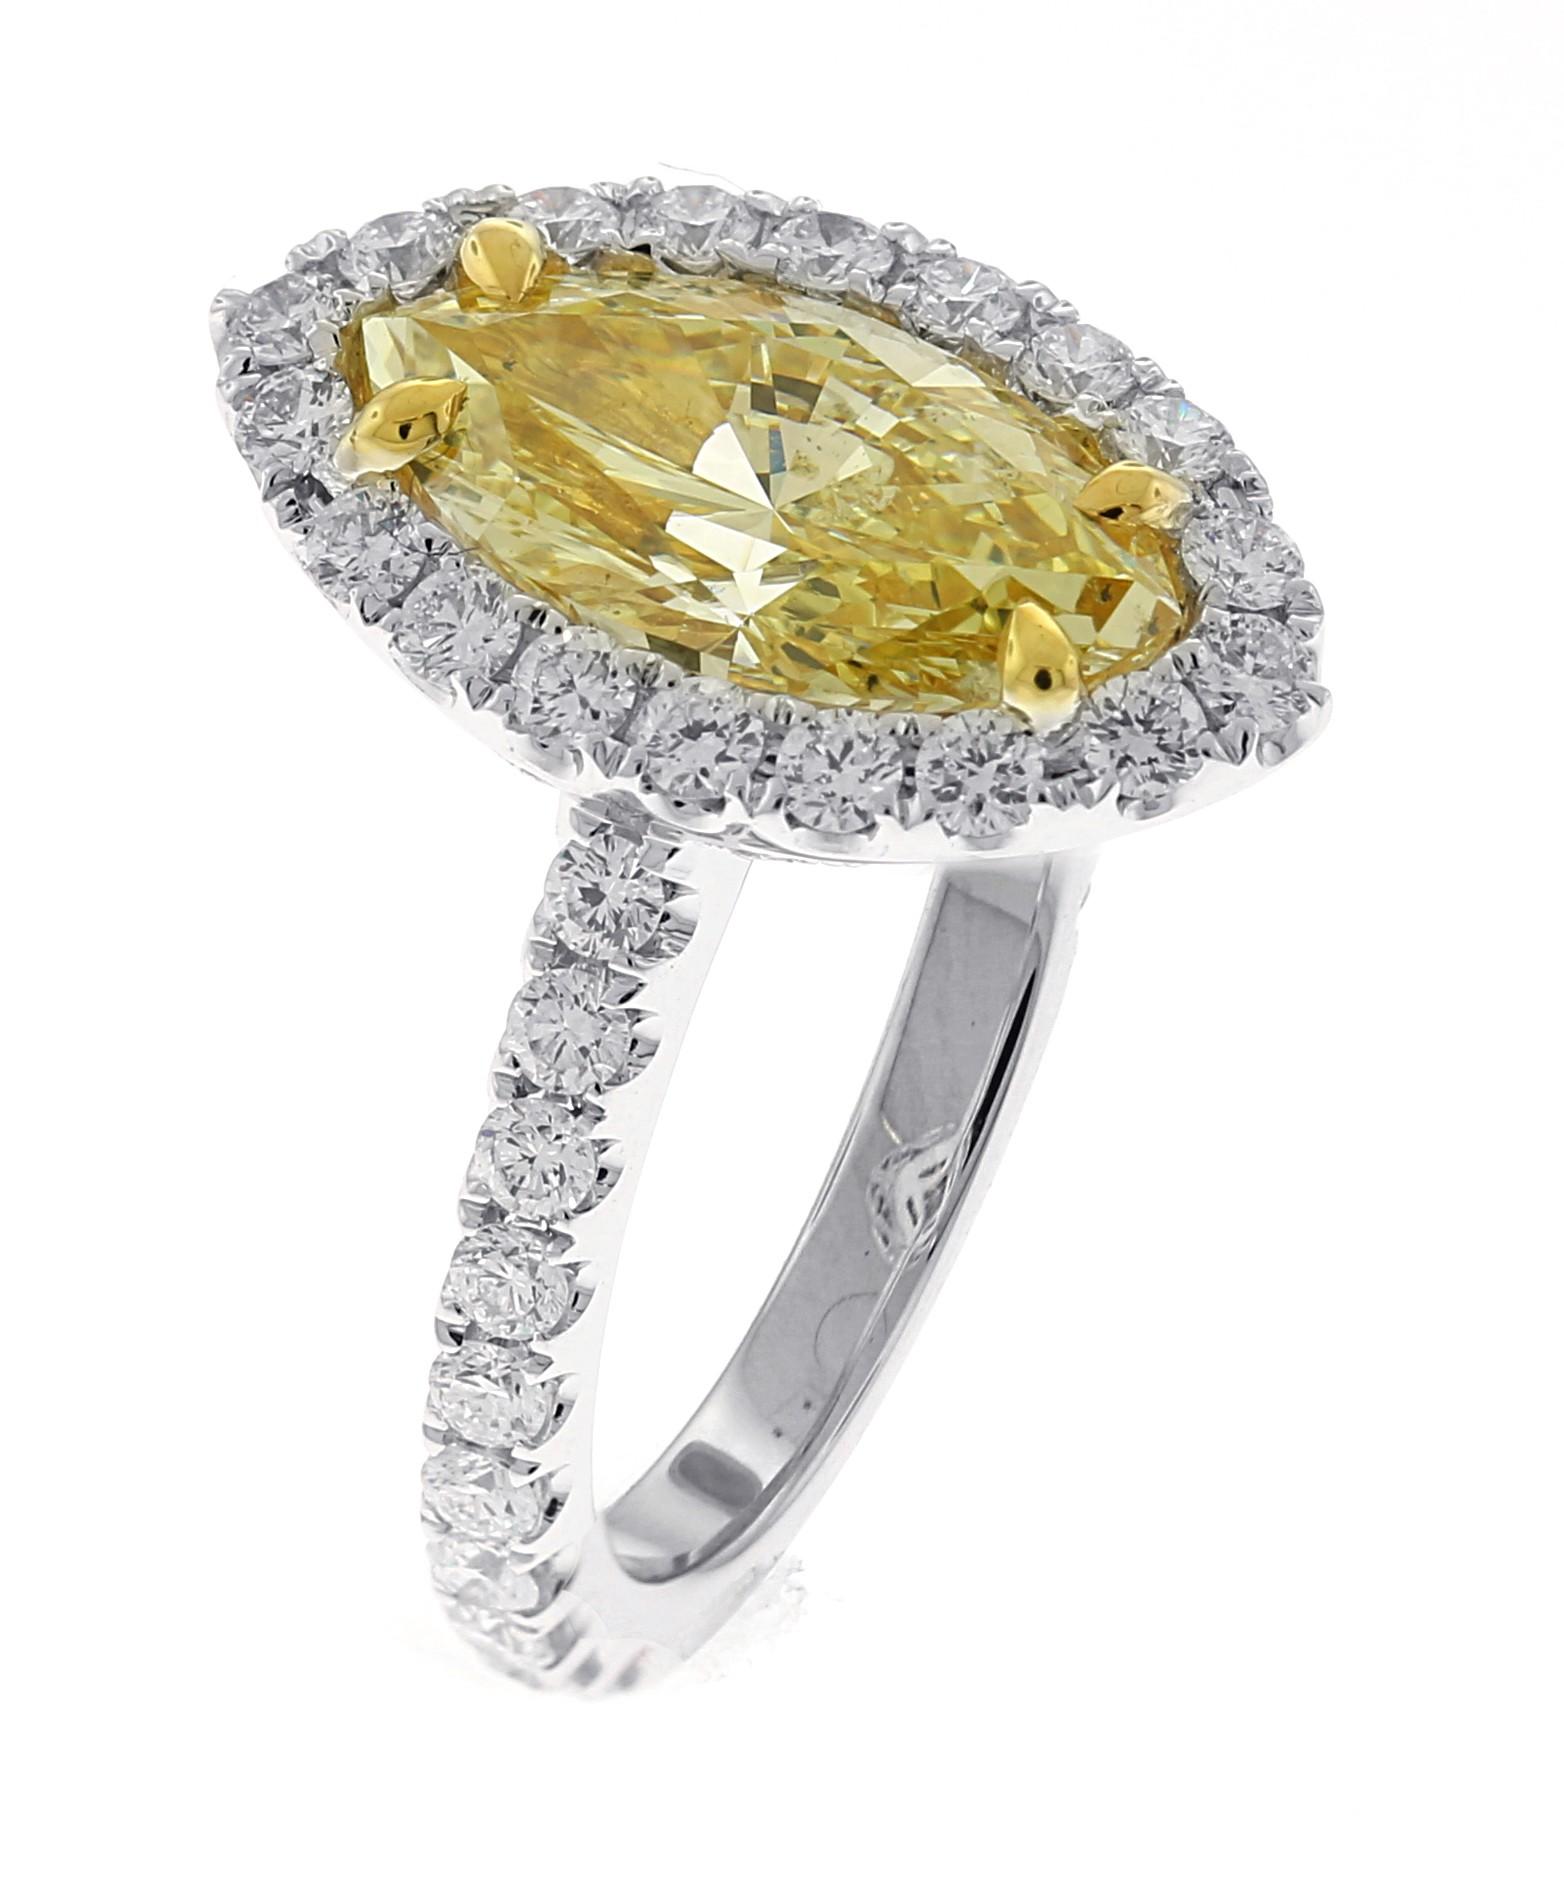 18kt White Gold GIA Certified Fancy Light Yellow Diamond Ring